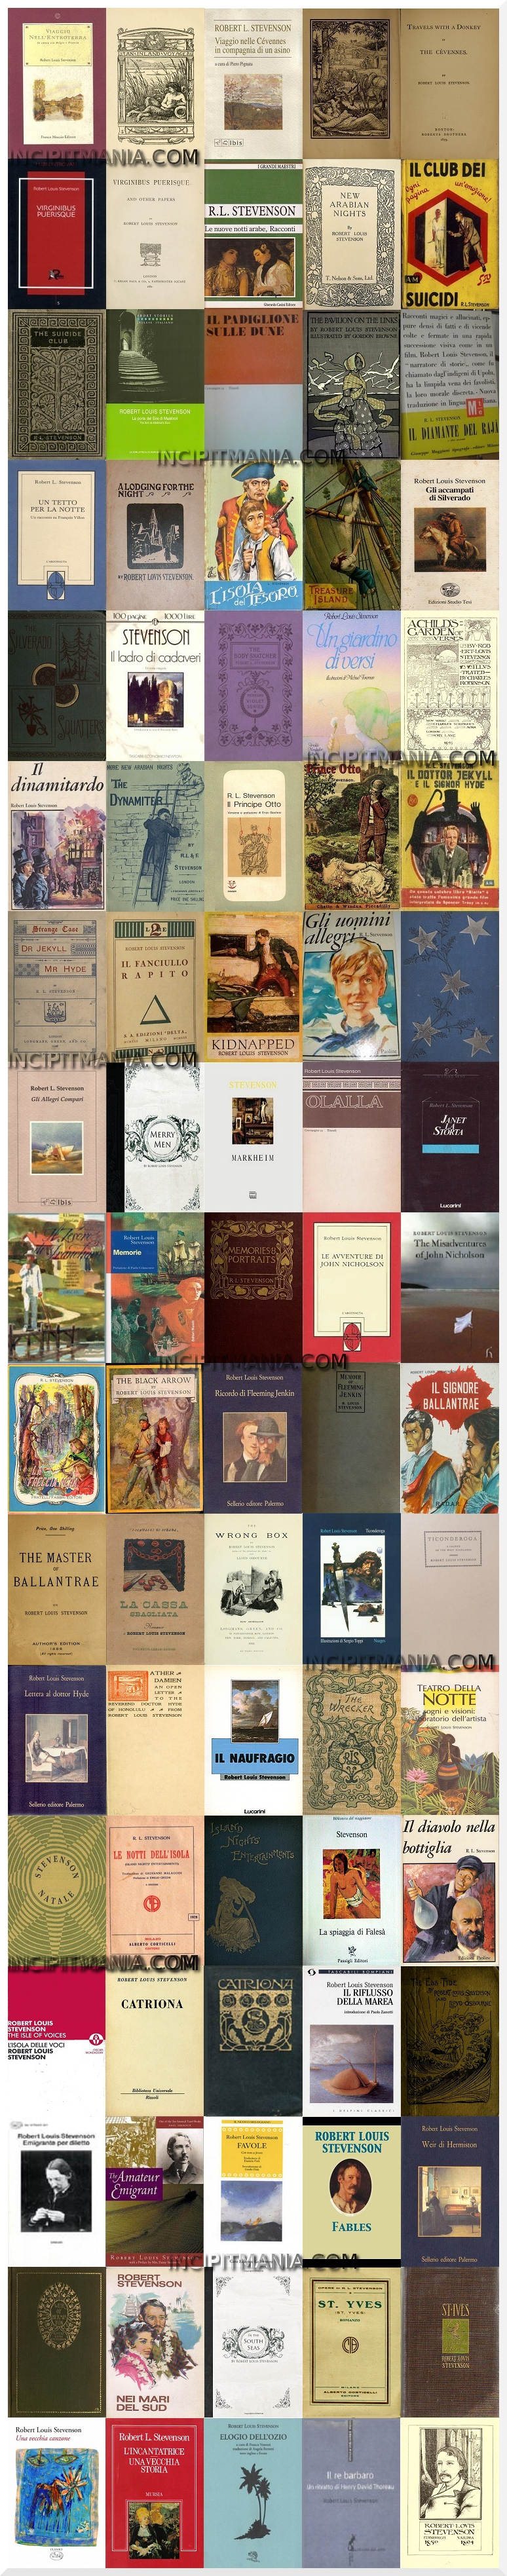 Robert Louis Stevenson - Opere - Bibliografia